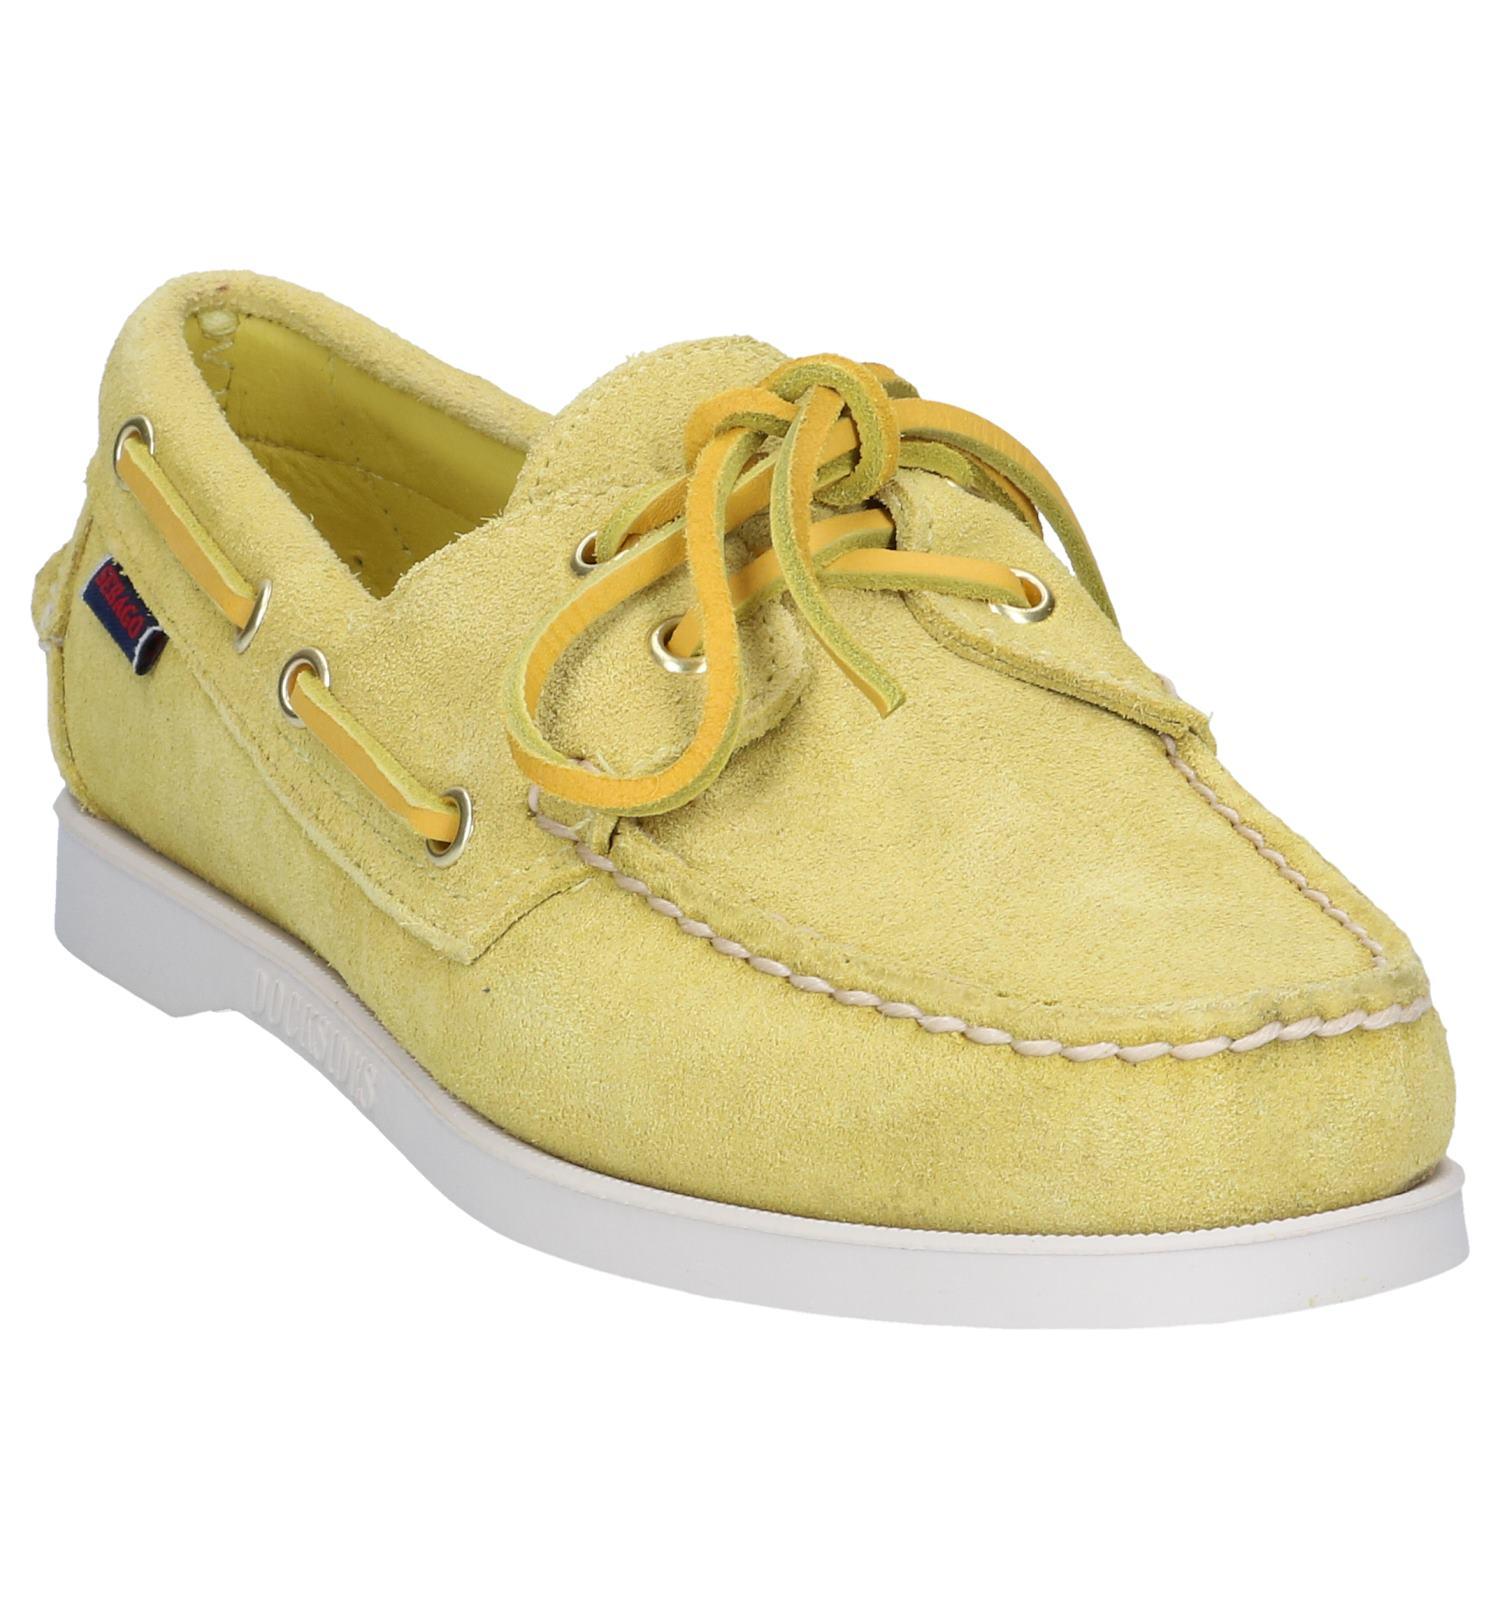 Bootschoenen Bootschoenen Sebago Gele Gele Bootschoenen Gele Gele Bootschoenen Dockside Sebago Dockside Dockside Sebago nONkwX0Z8P